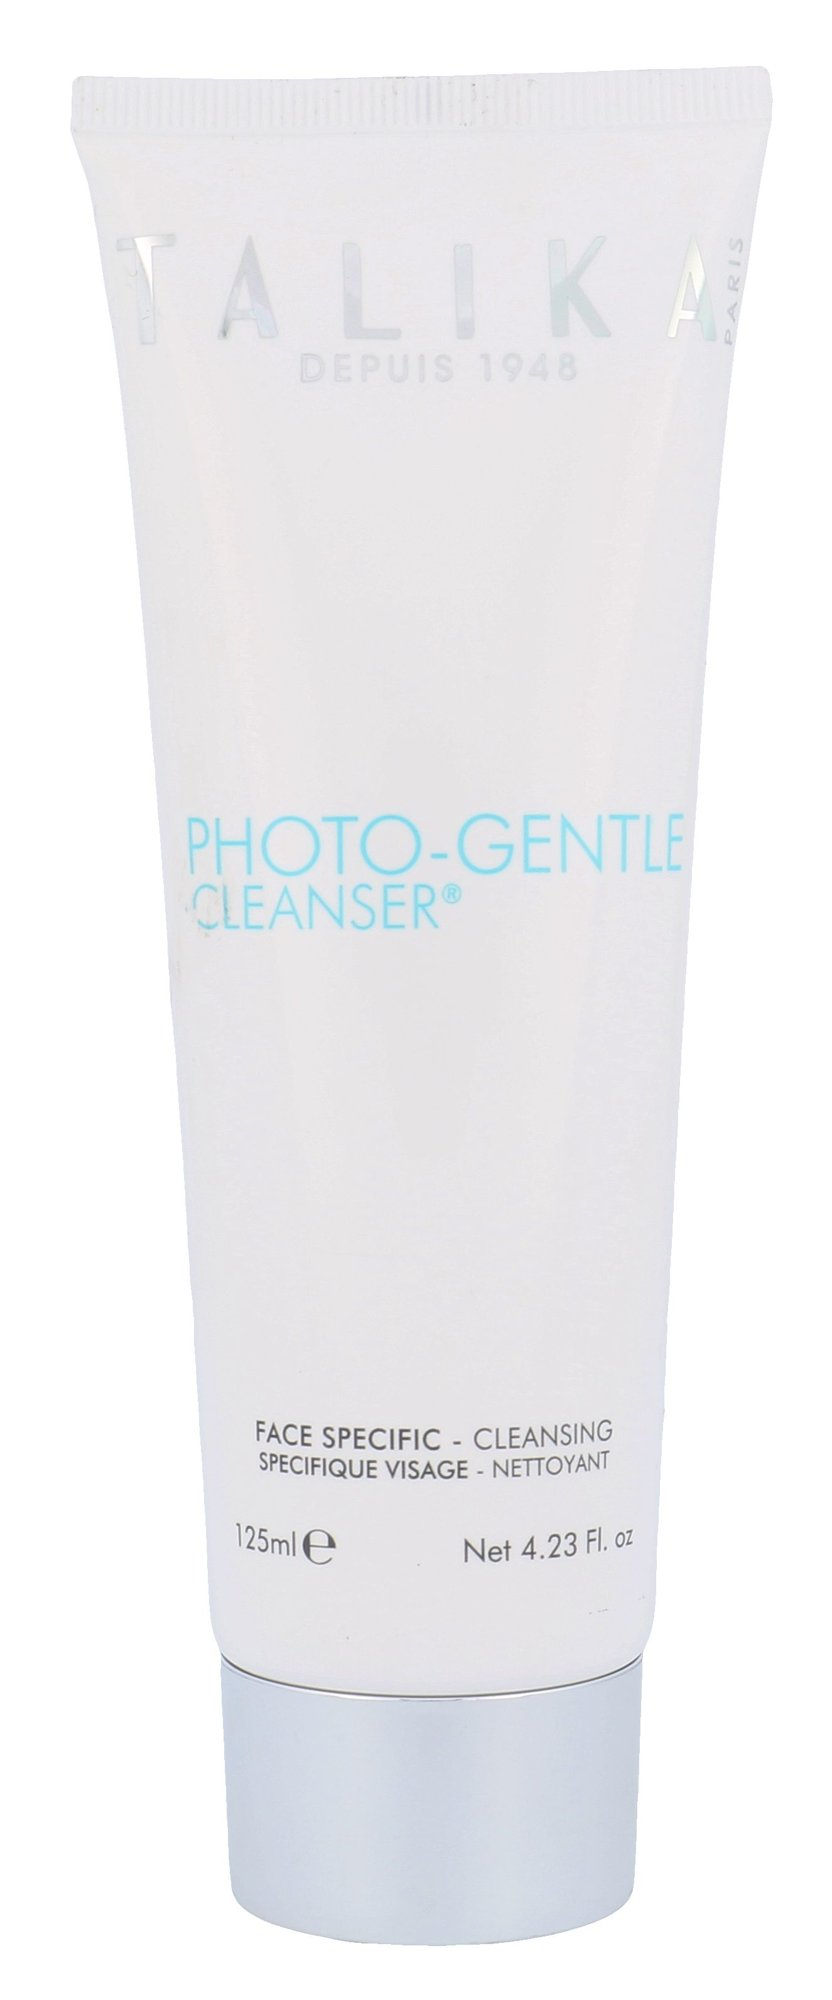 Talika Photo-Gentle Cleanser Cosmetic 125ml